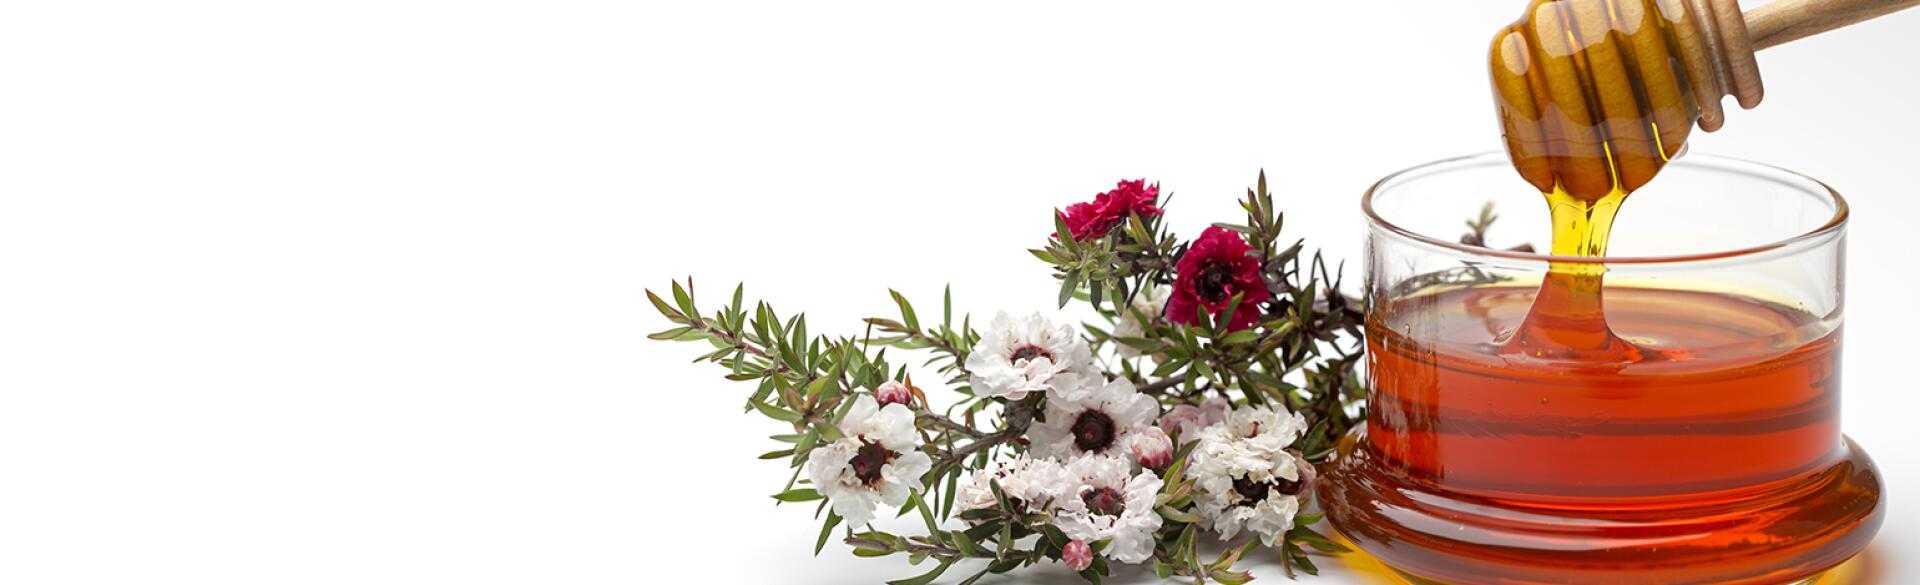 jar of manuka honey next to flowers